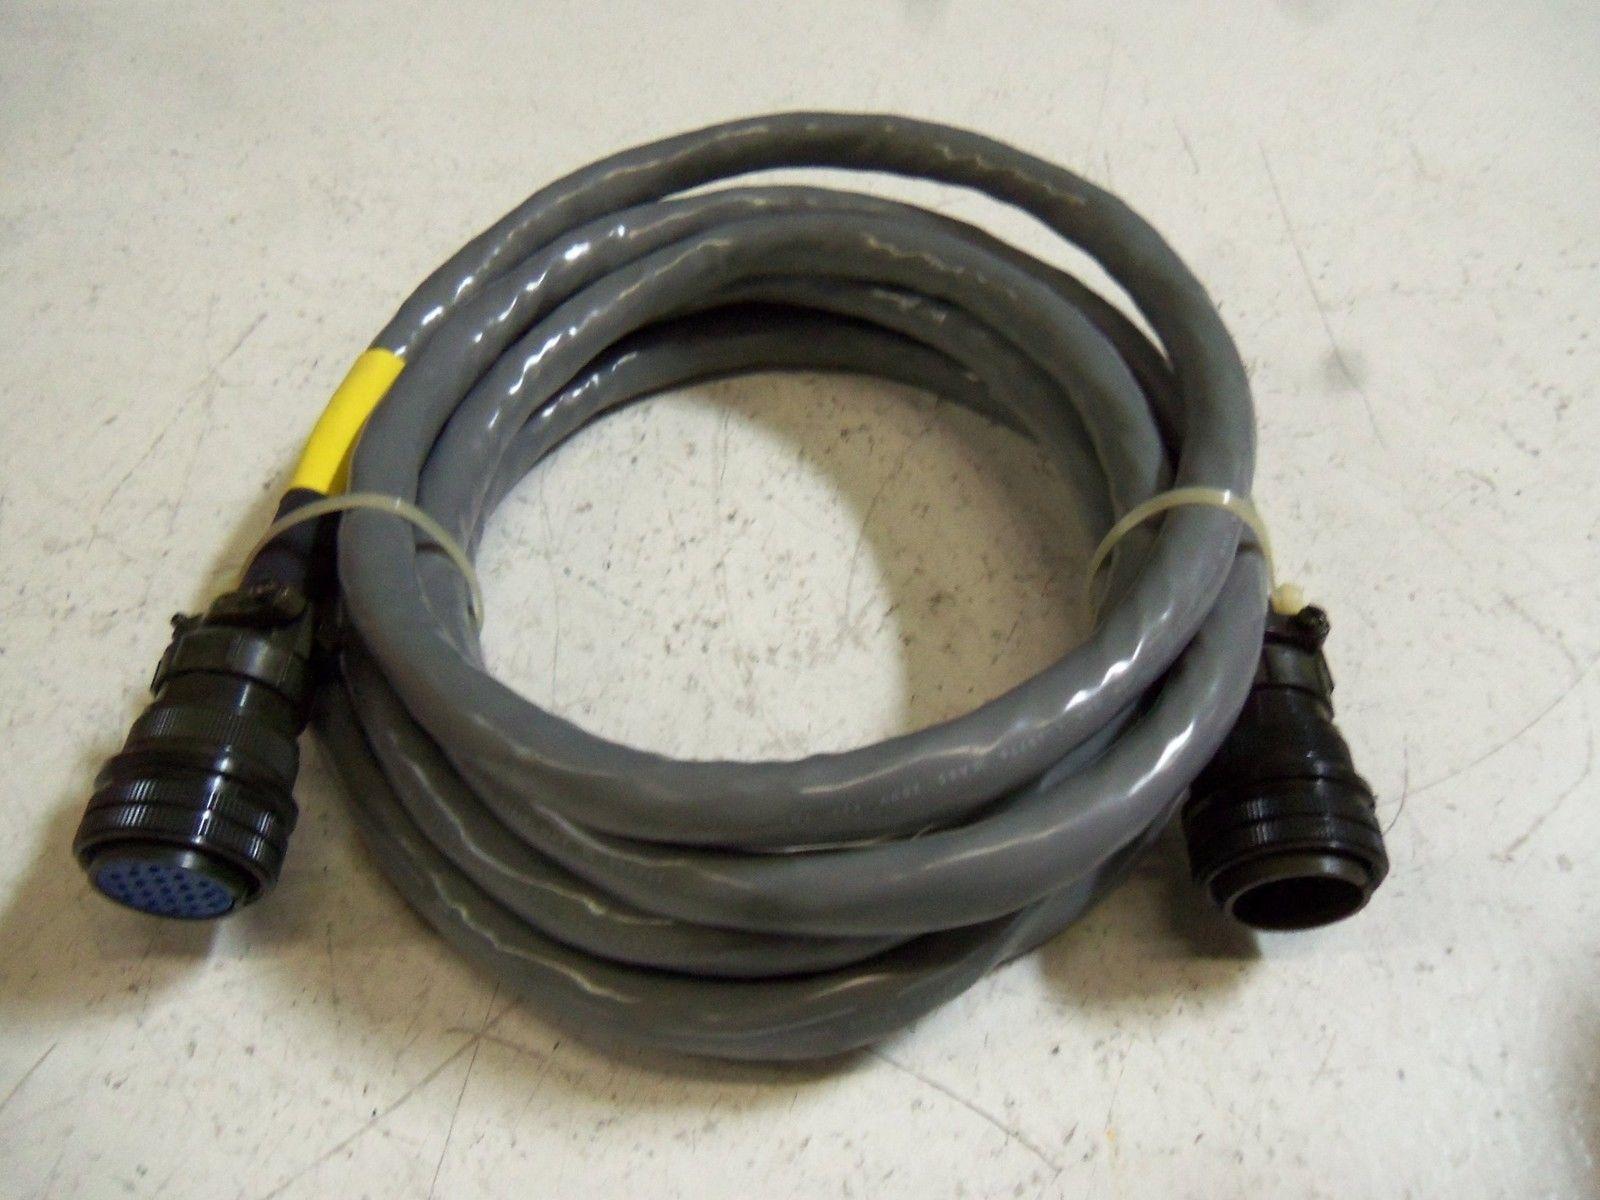 Emerson Tdl 15 Servo Motor Cable Used Ebay